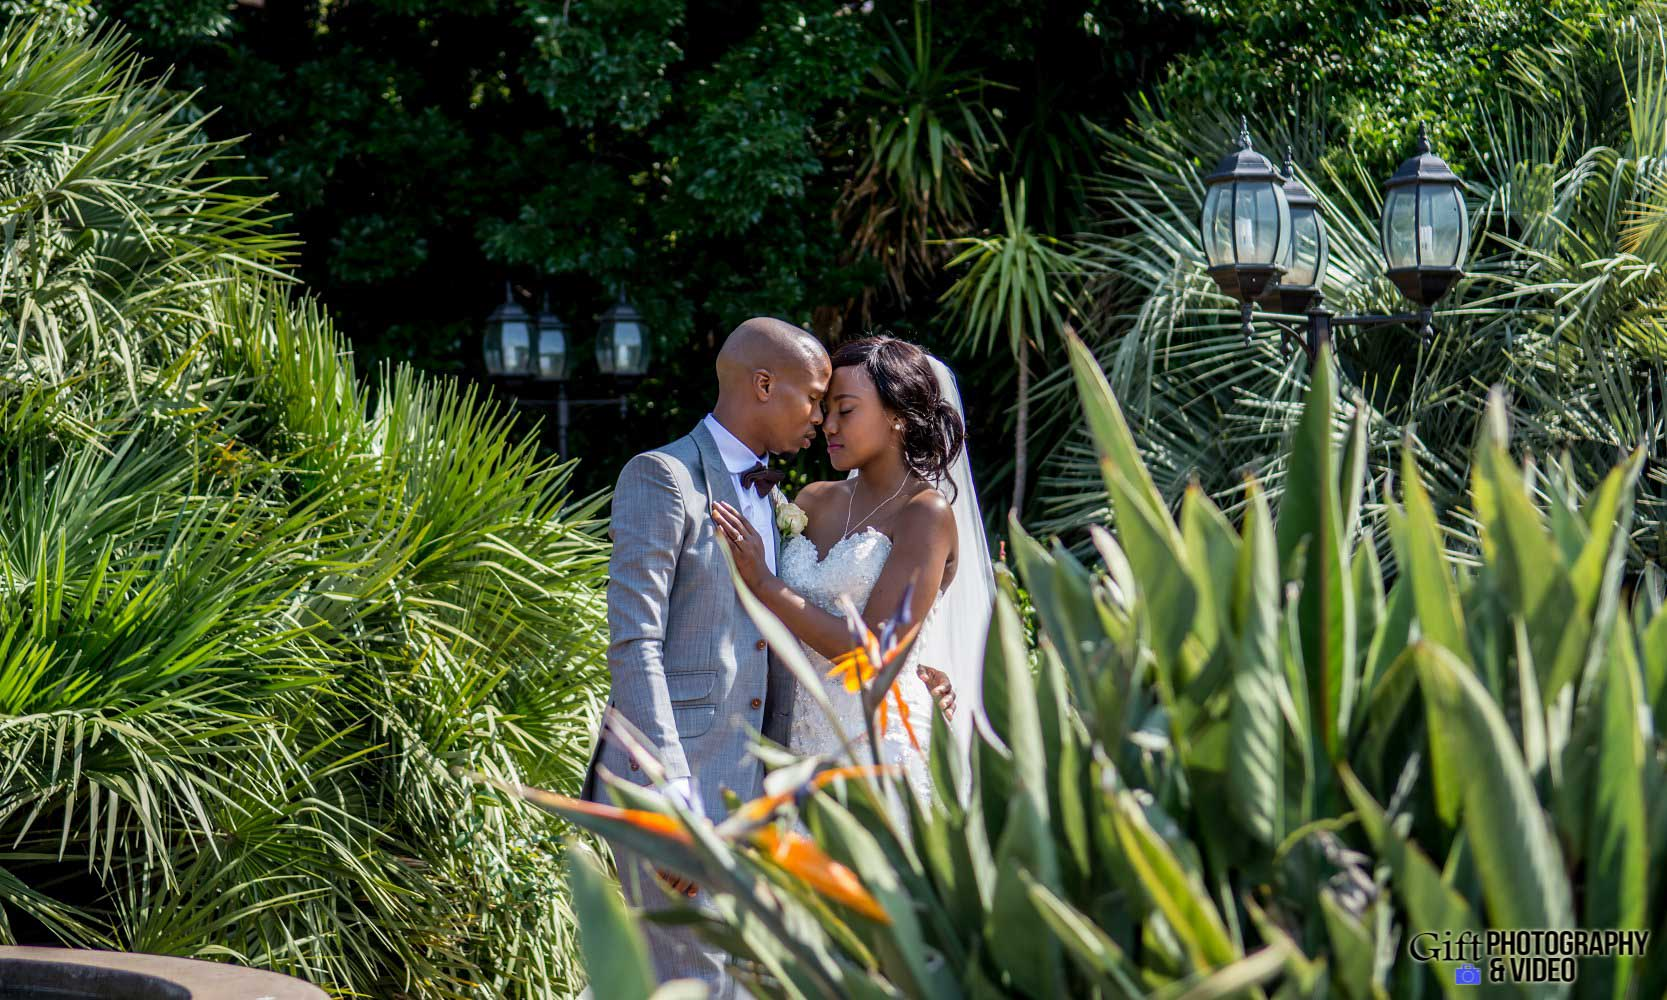 Choene & Sihle Wedding Usambara-28